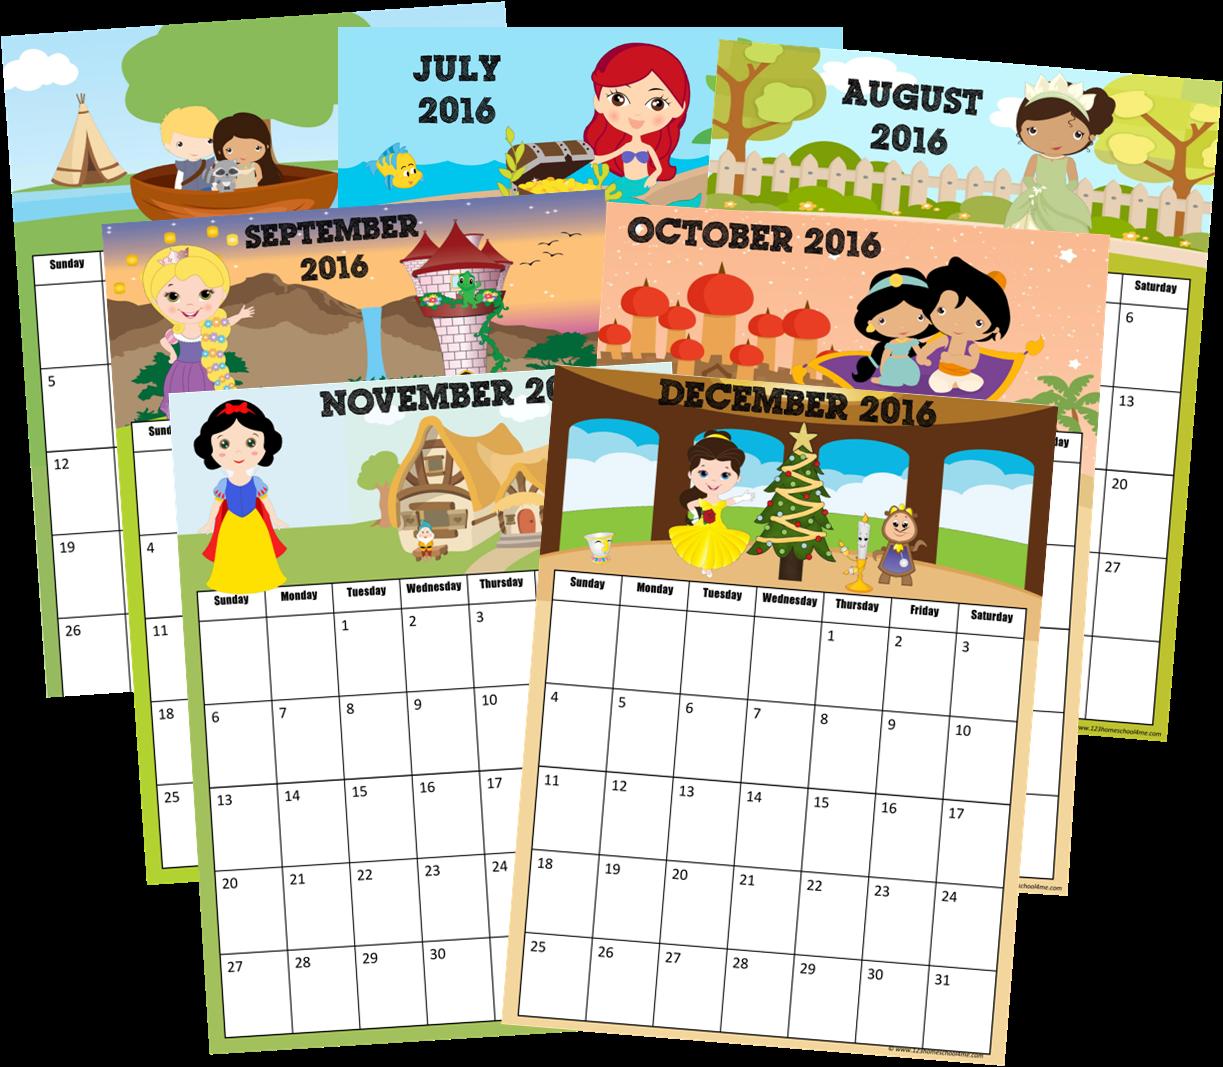 2016 Calendar (Disney Princess Inspired)